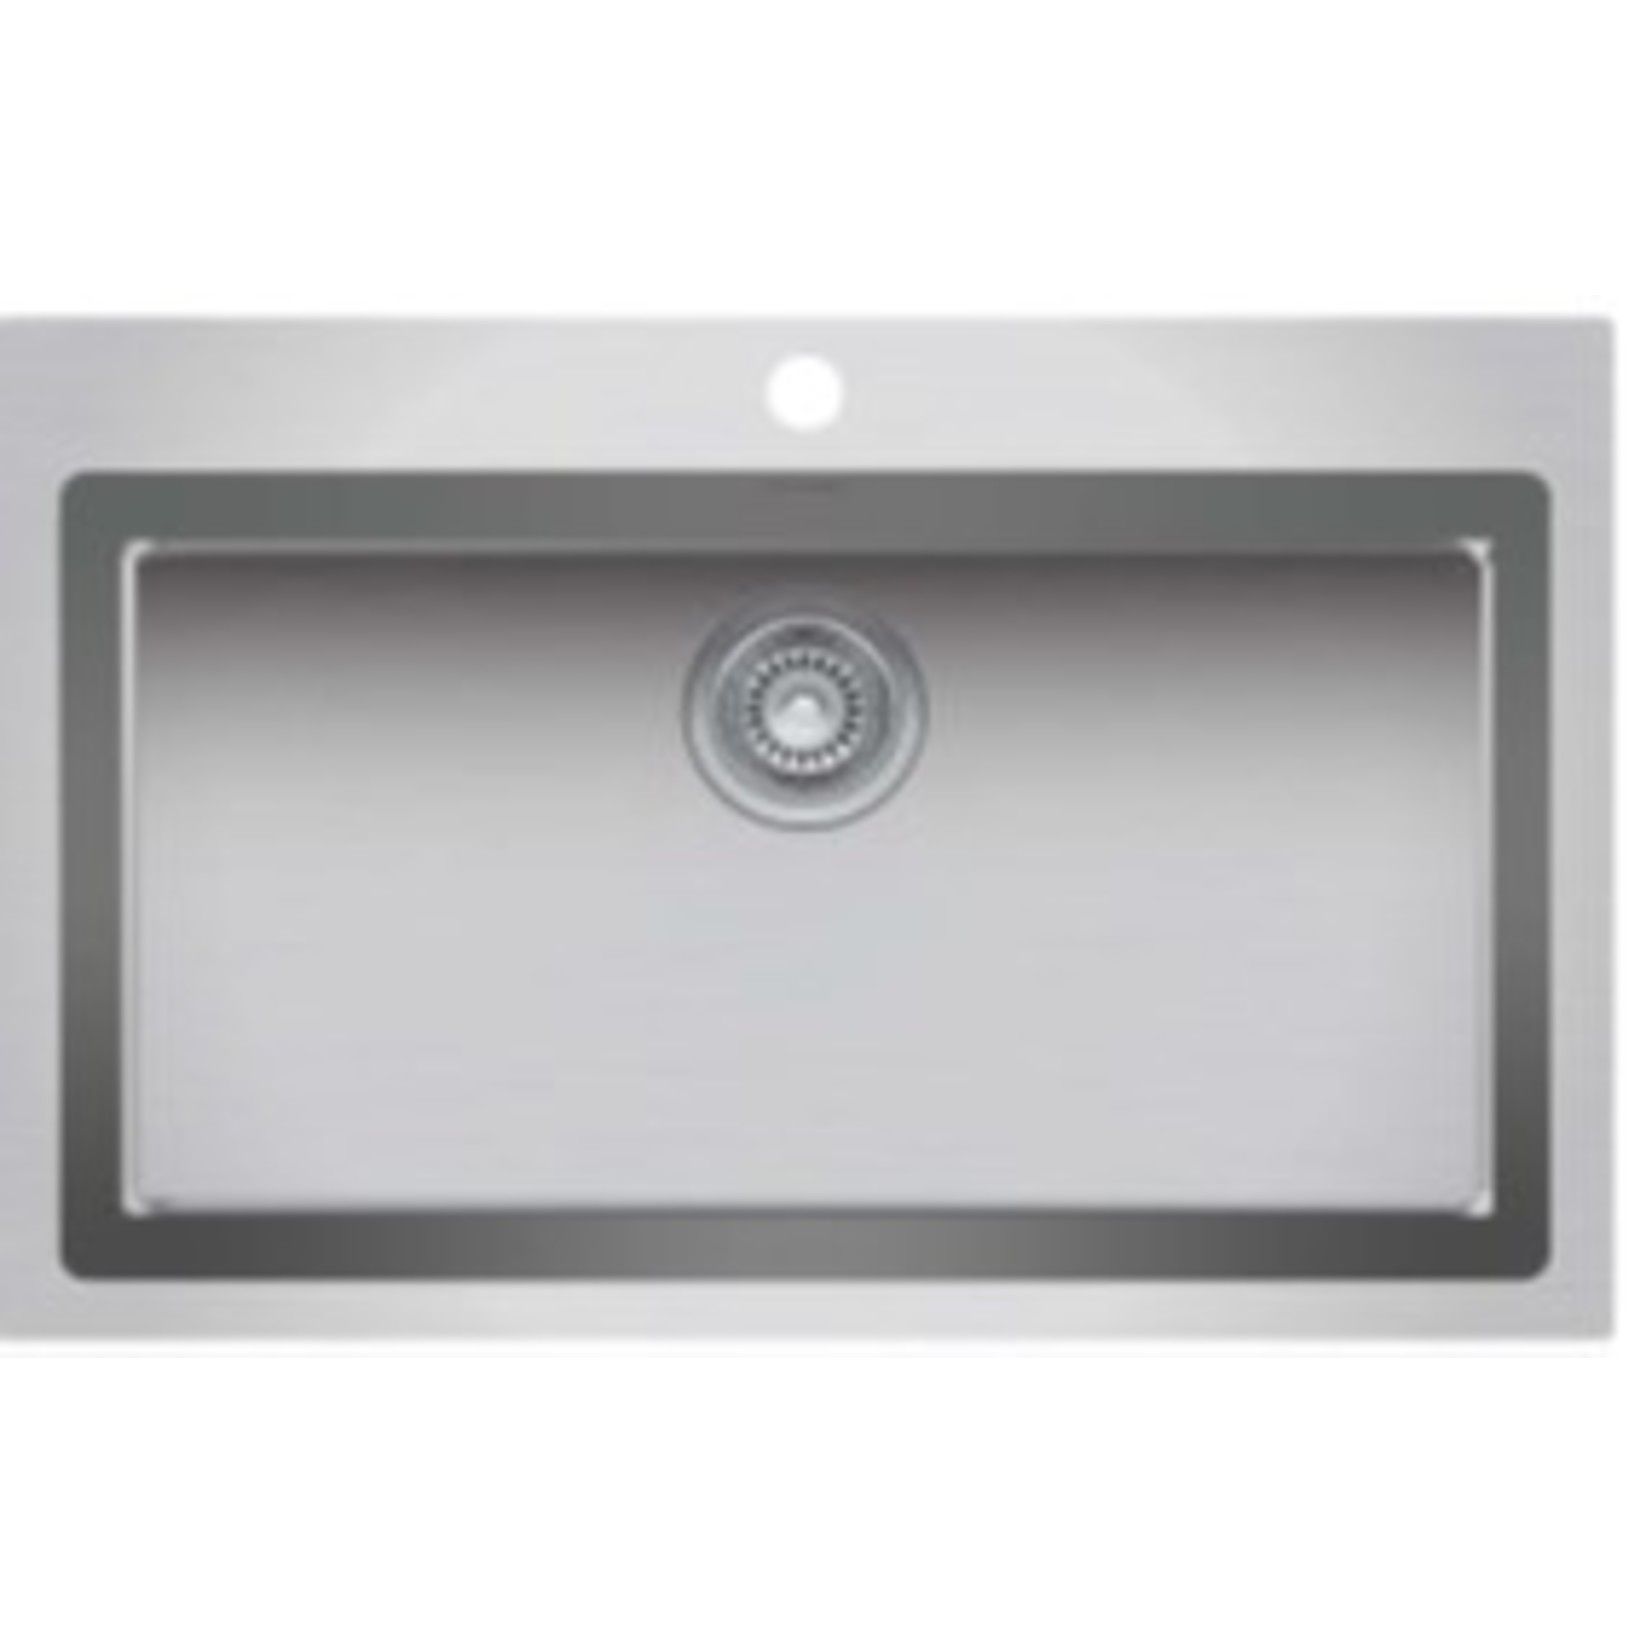 "Single bowl countertop kitchen sink 313/8 ""x 205/8"" x 9 ""Nautika ZR103"